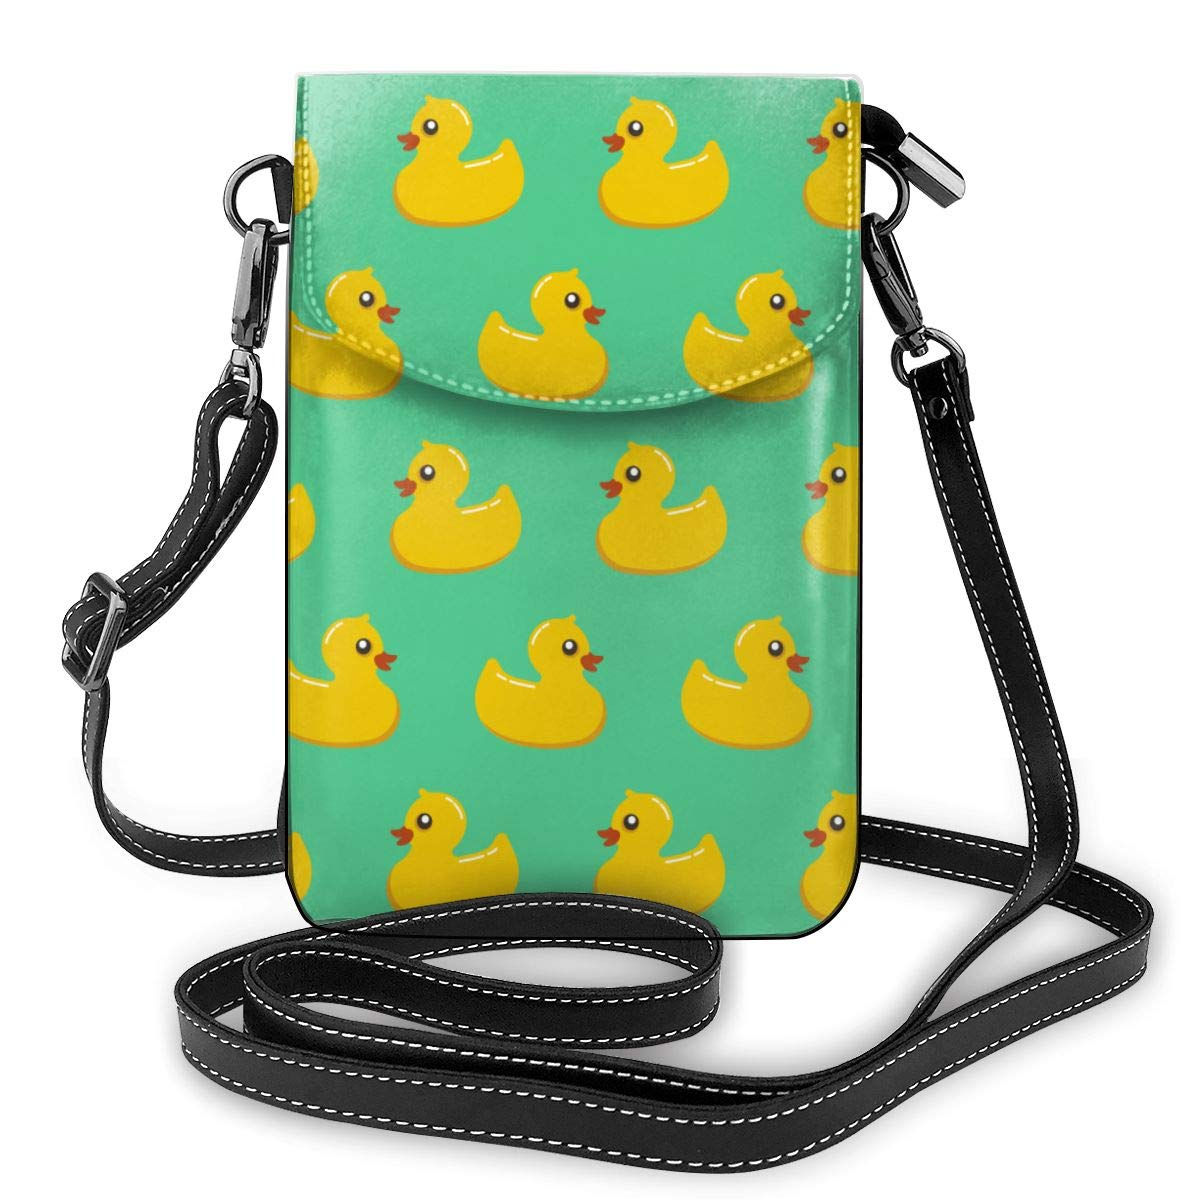 Amazon.com: YongColer Fashion Small Cellphone Crossbody ...